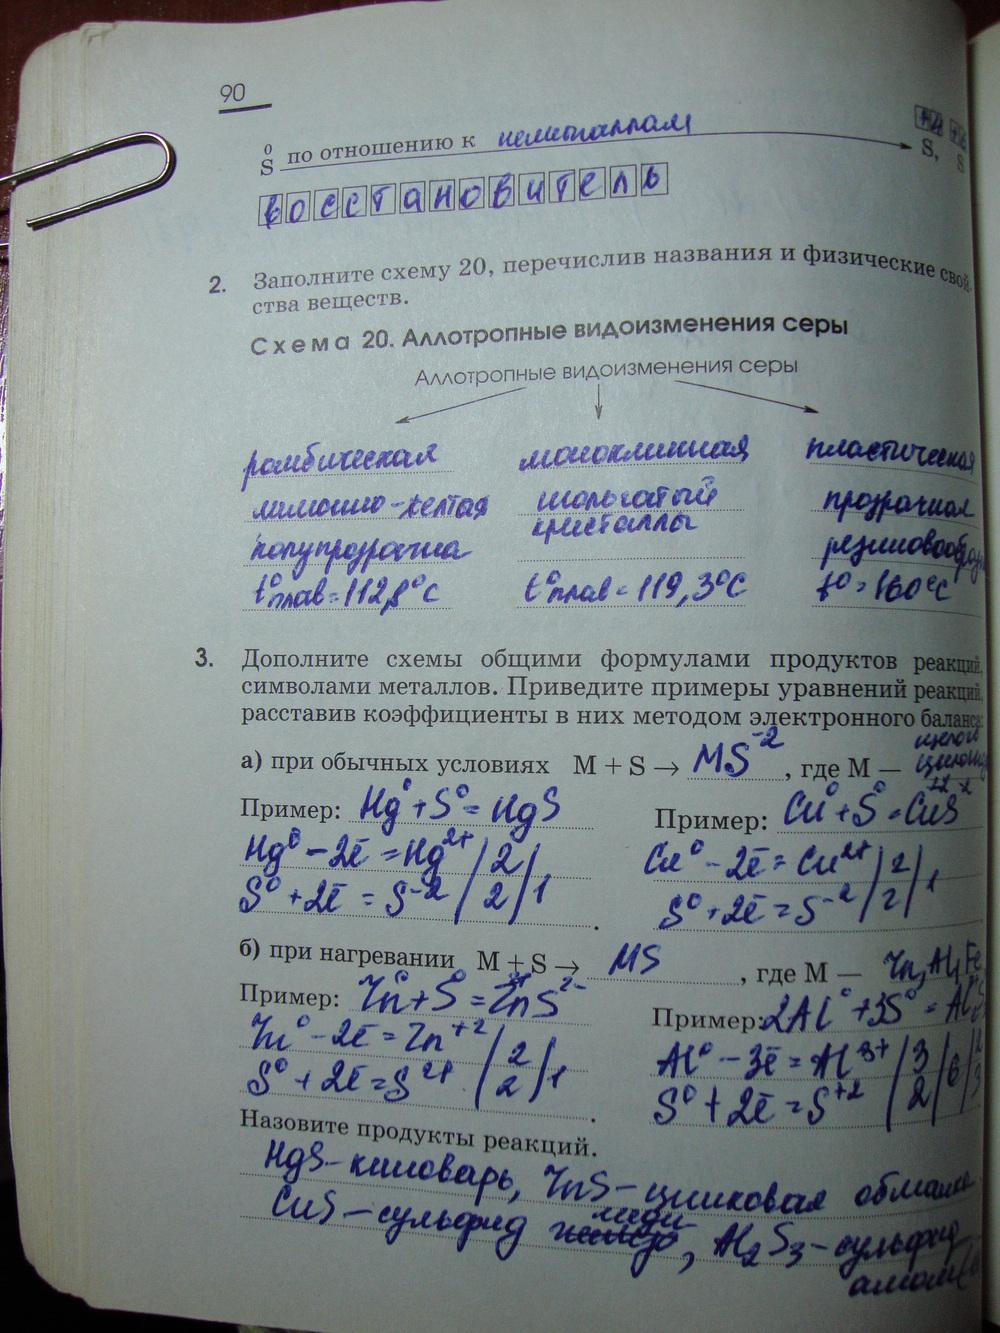 гдз по химии 9 класс рабочая тетрадь онлайн